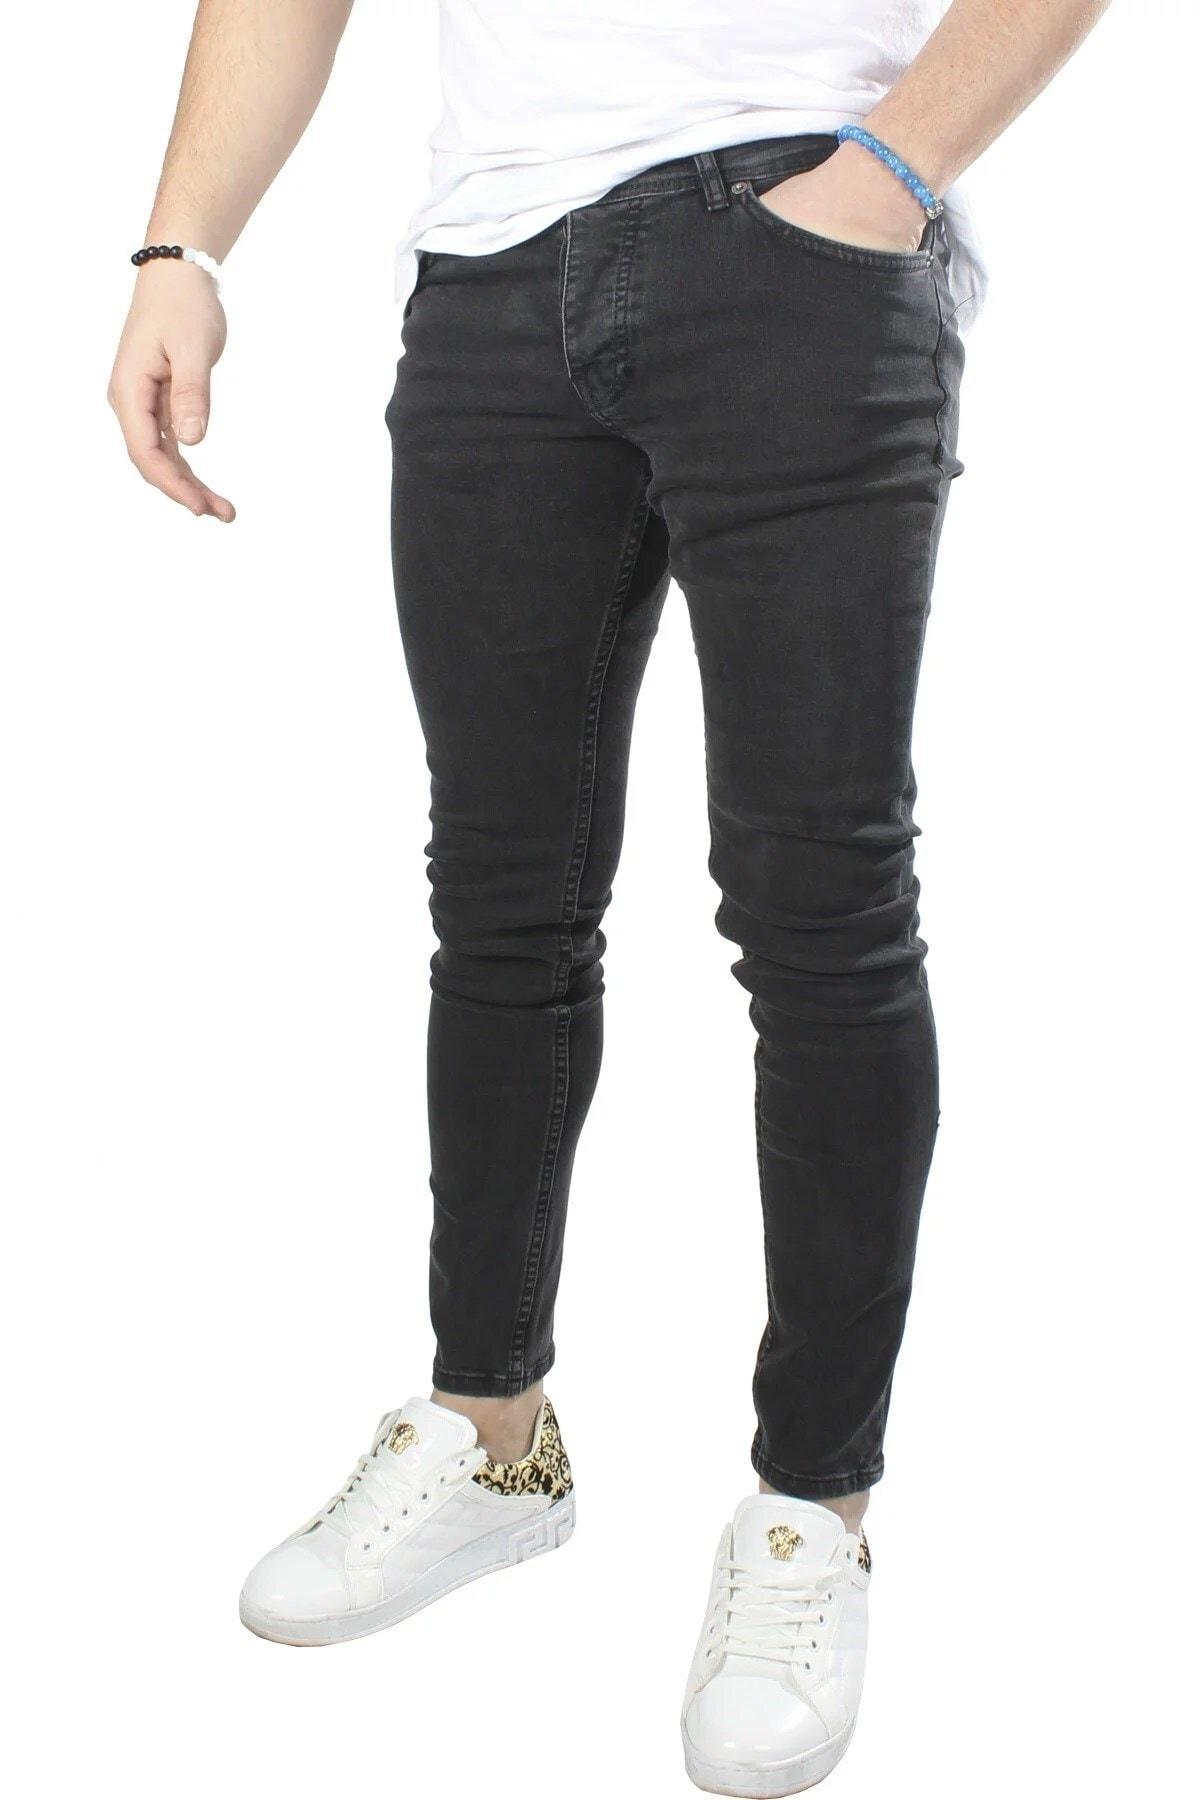 Terapi Men Erkek Kot Pantolon 8K-2100306-004-1 Füme